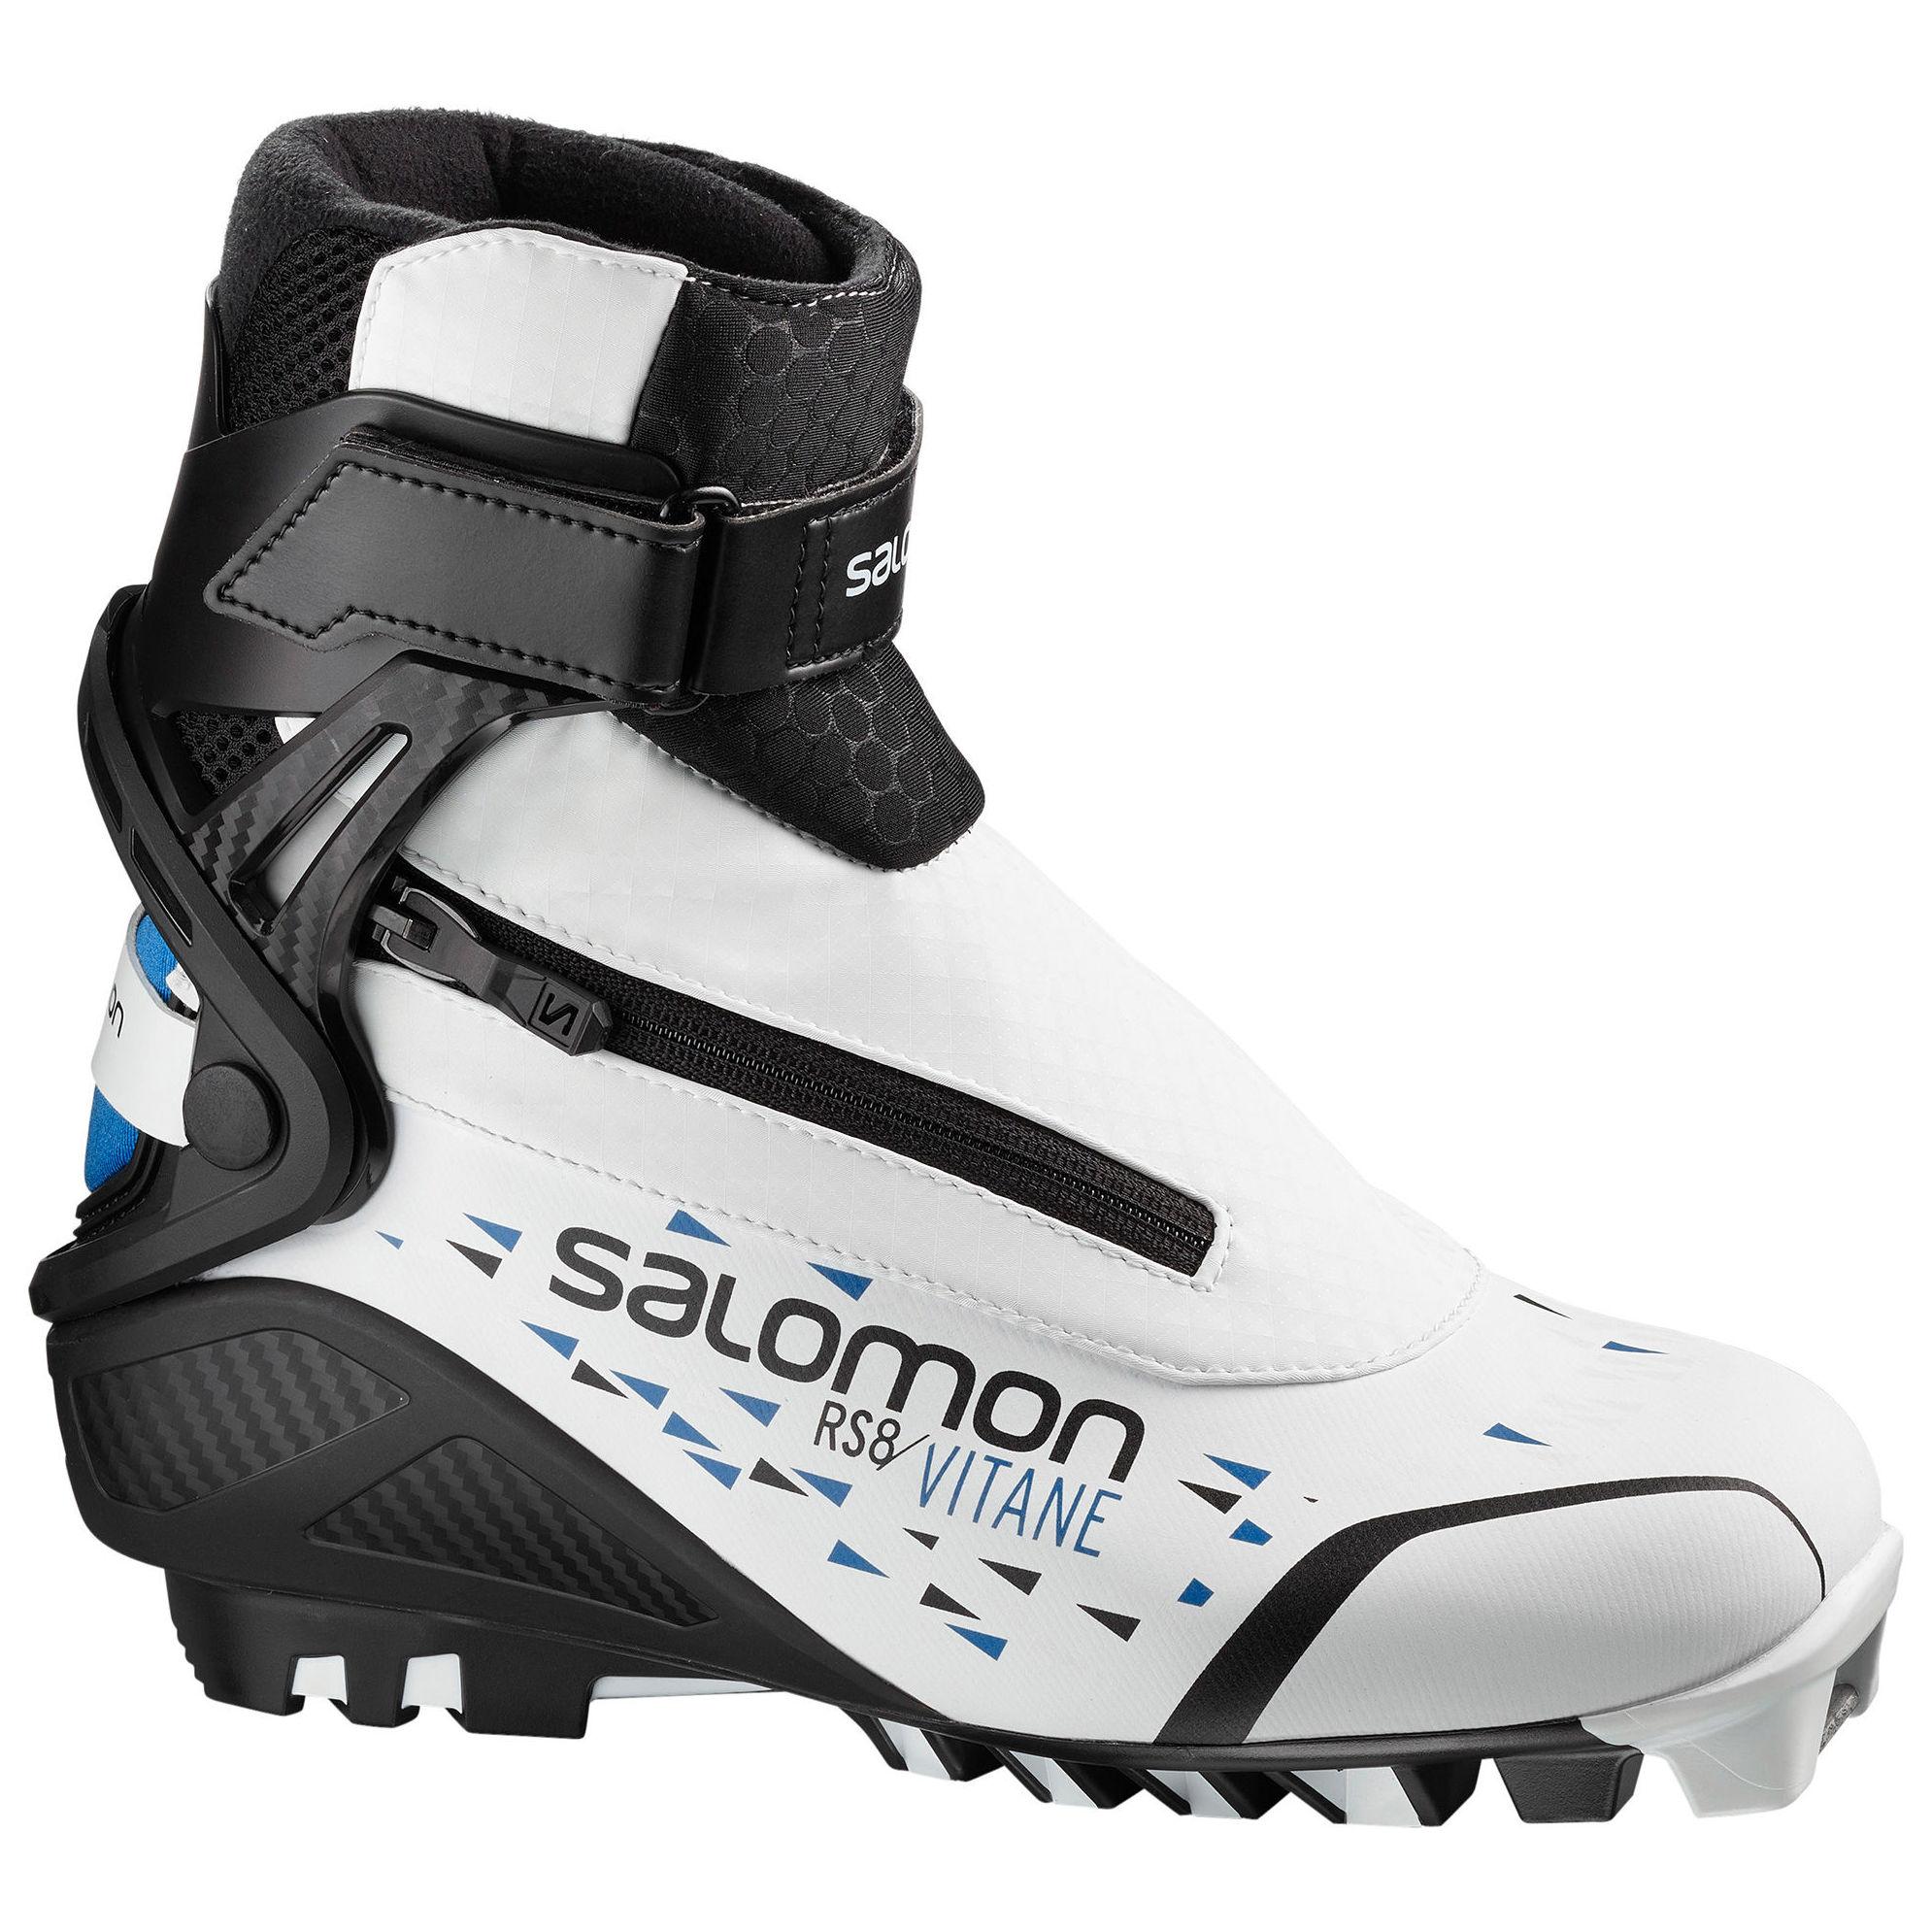 Botas Salomon para esquí de fondo, modalidad patinador